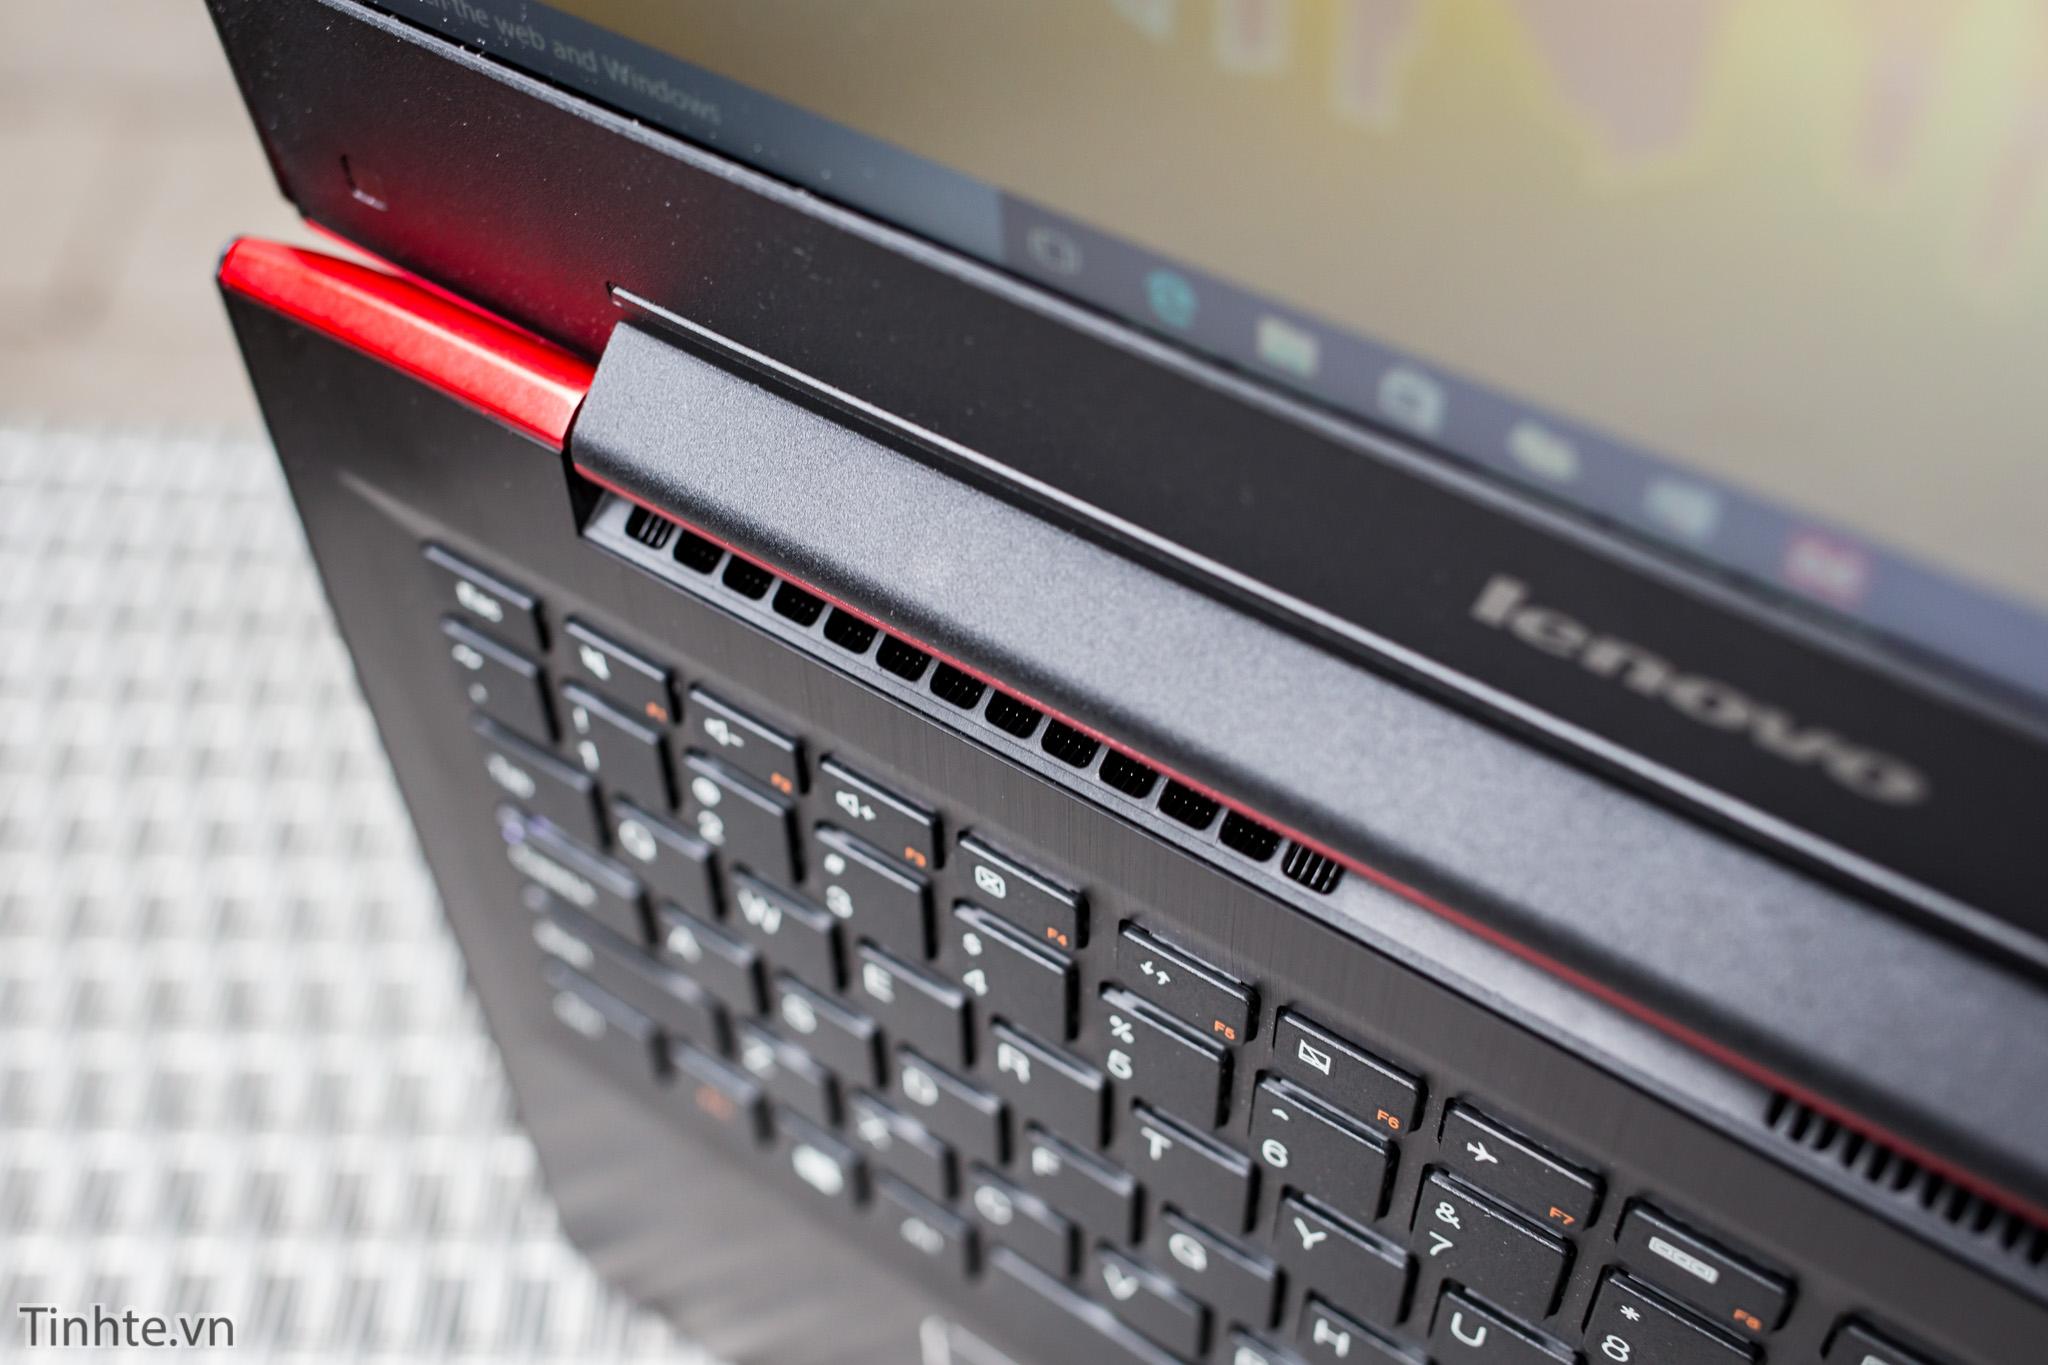 Tinhte.vn_Lenovo_IdeaPad_500s-16.jpg